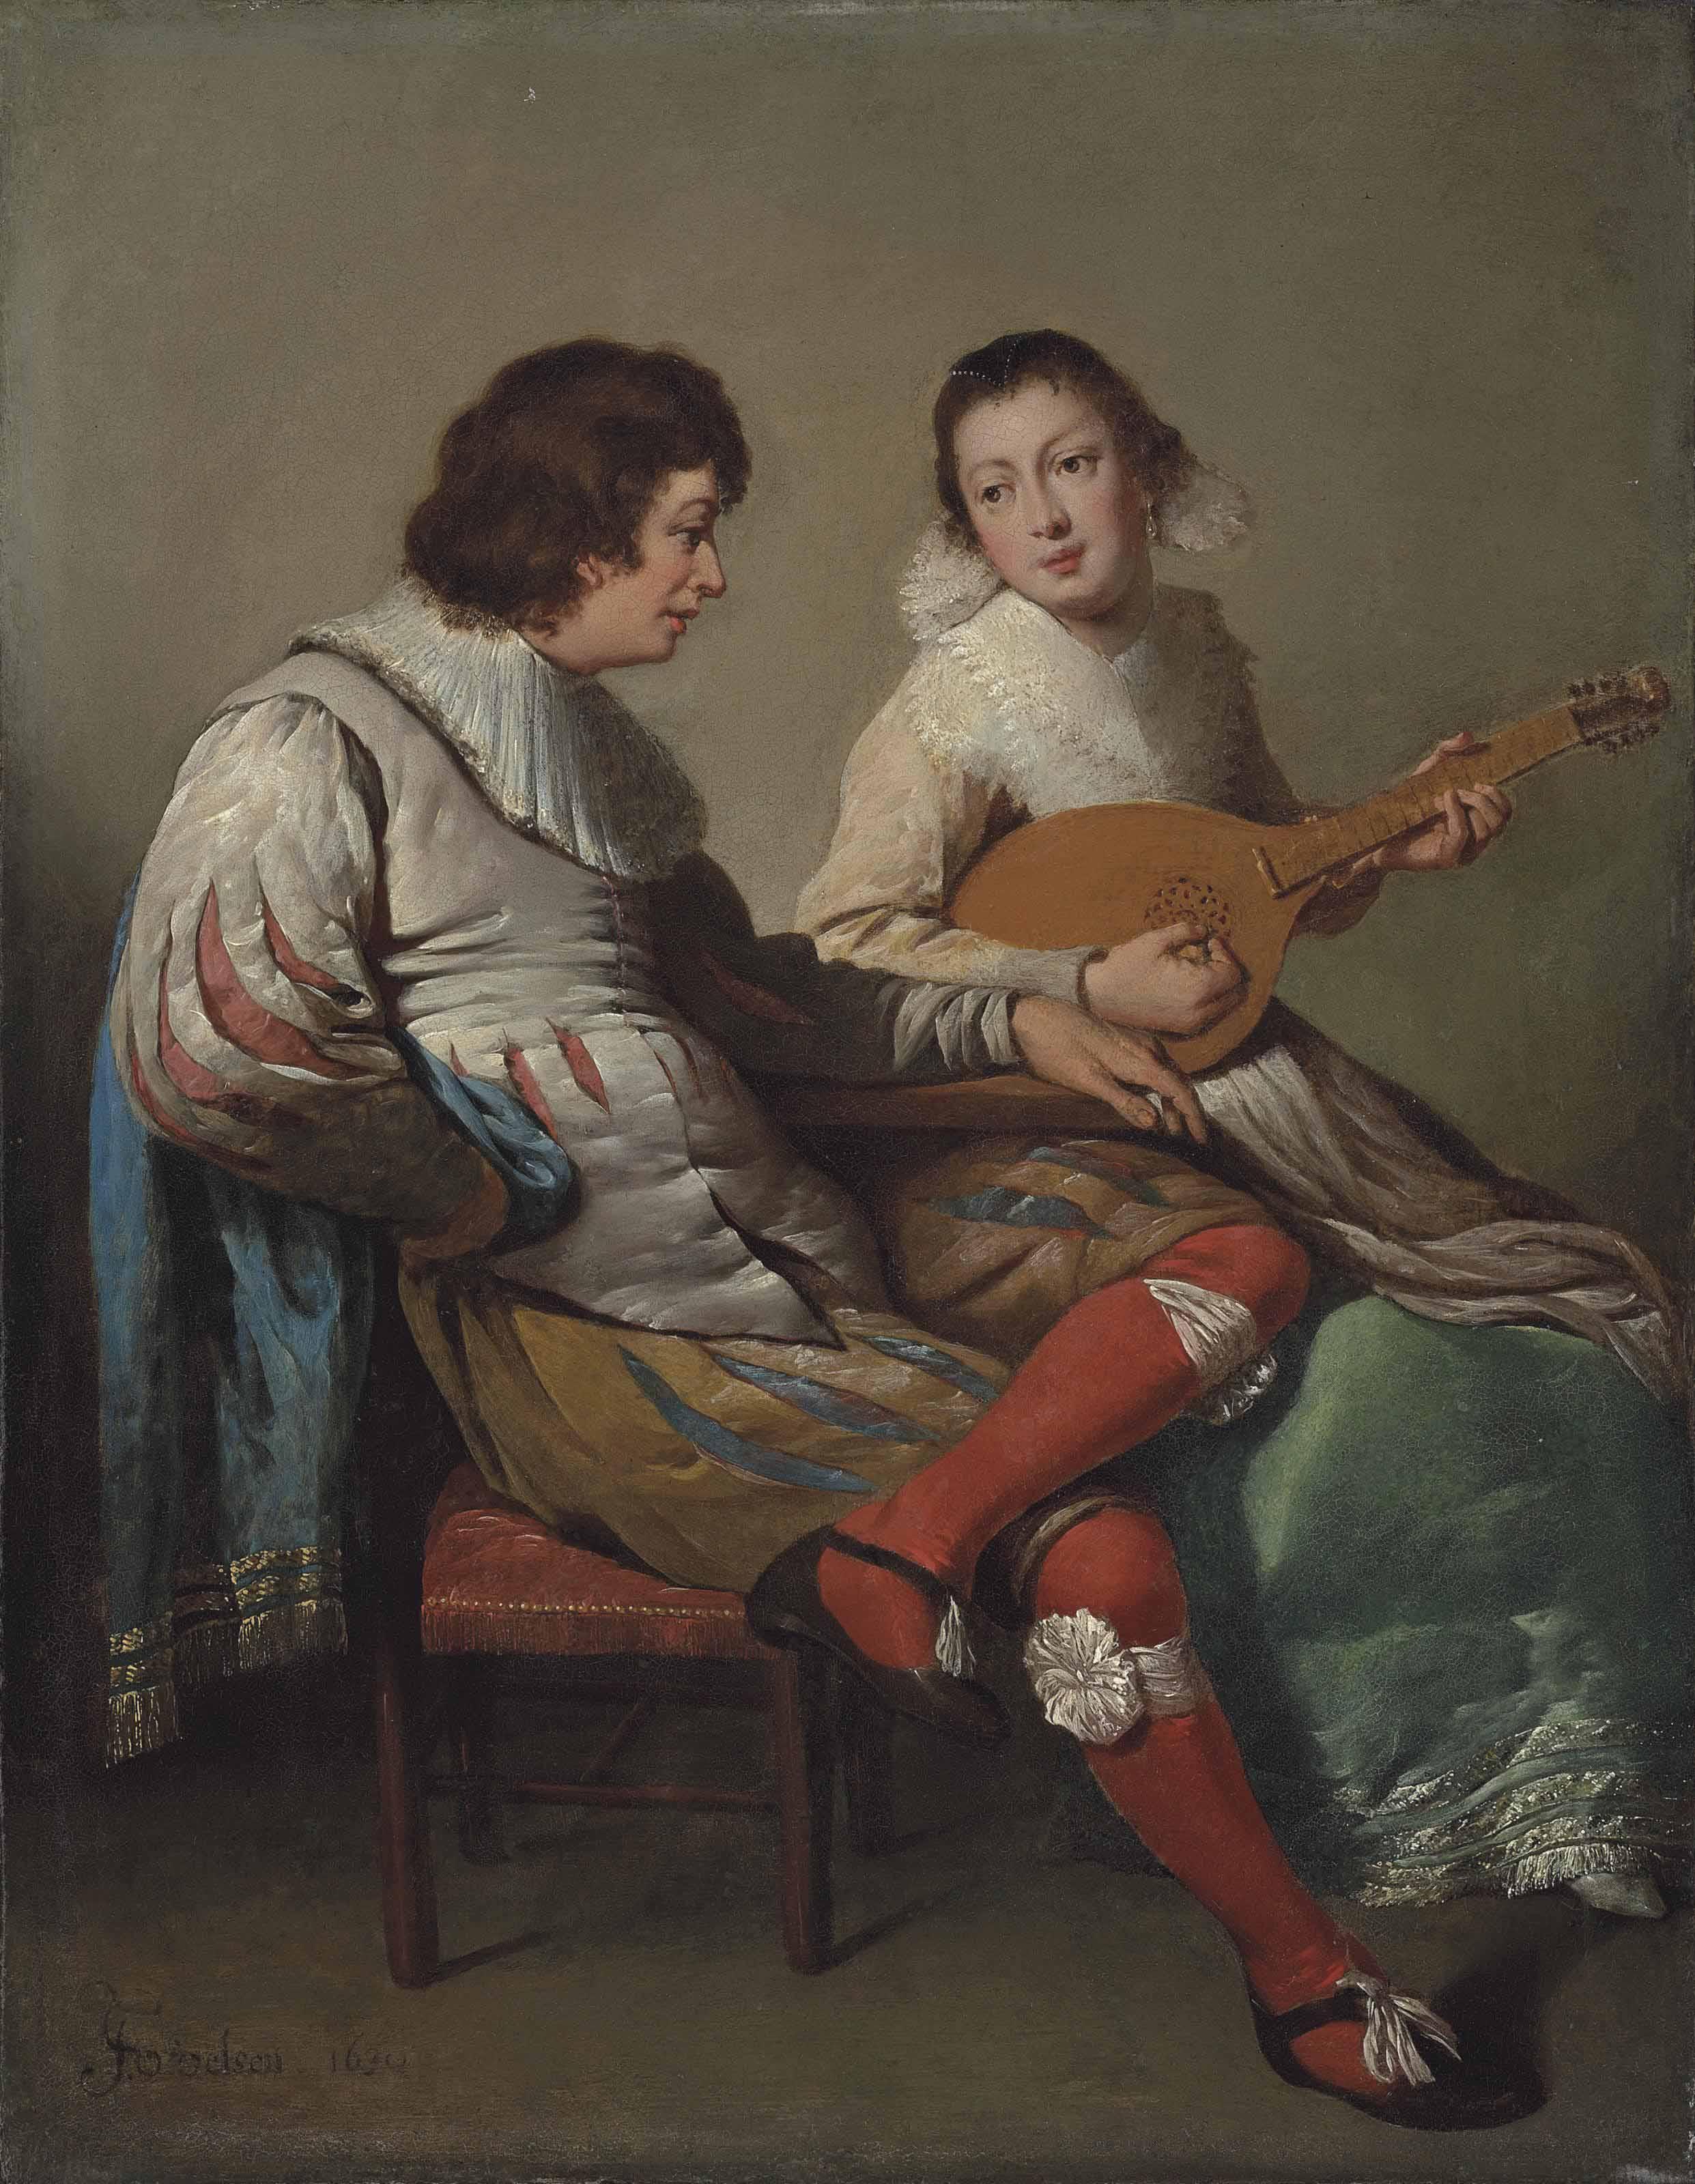 An elegant couple playing music